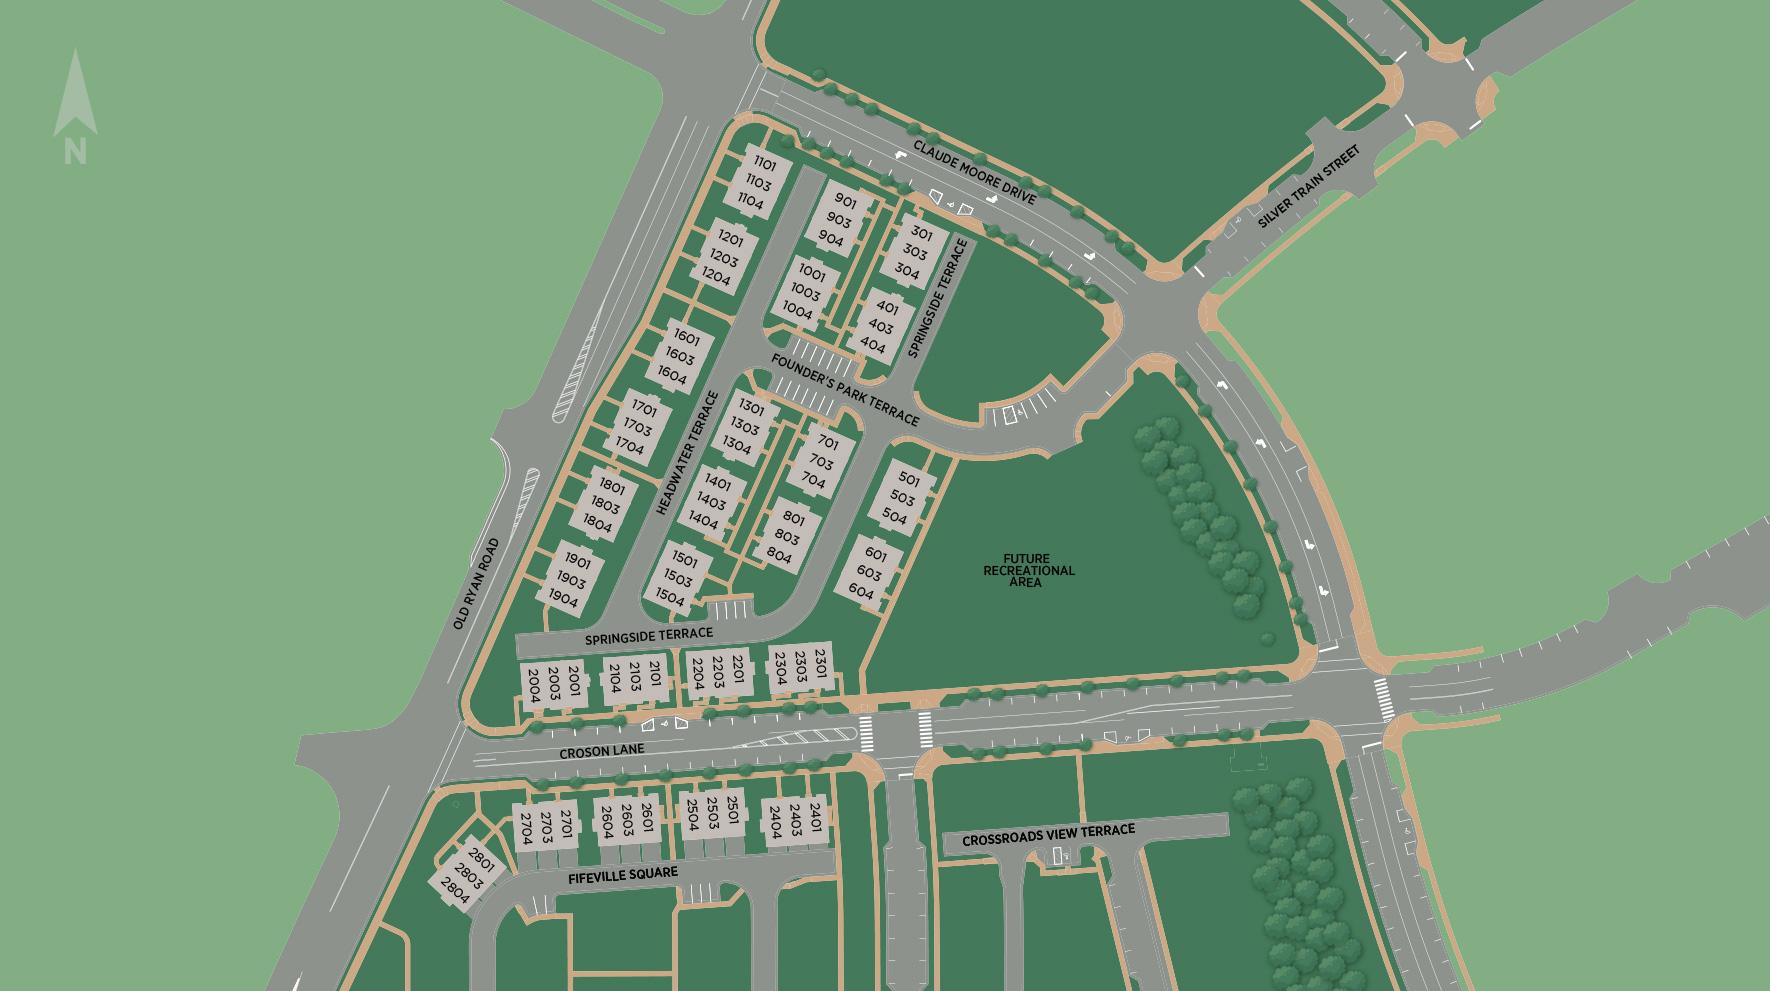 Metro Walk at Moorefield Station - Flats Site Plan II